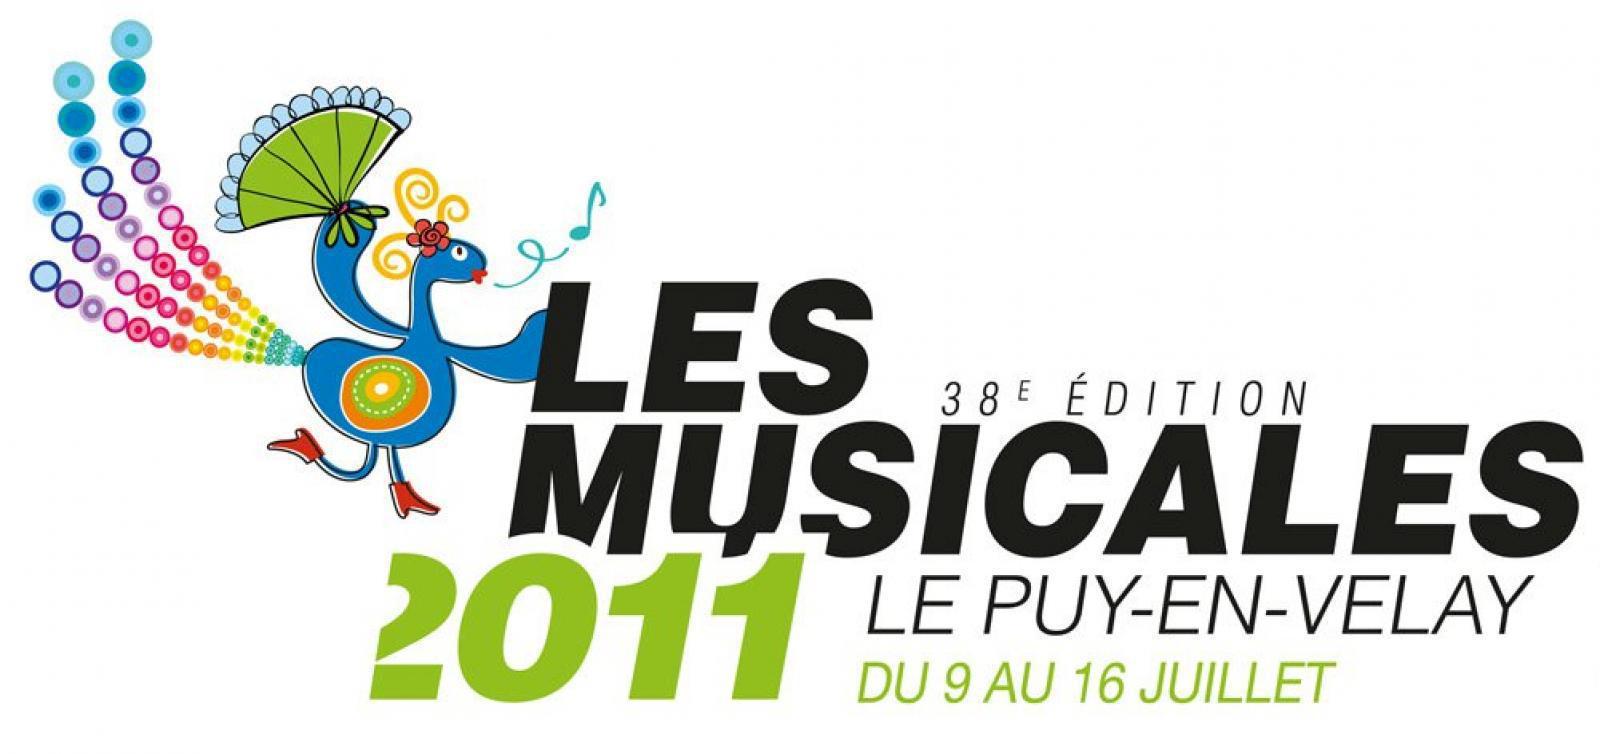 Les Musicales